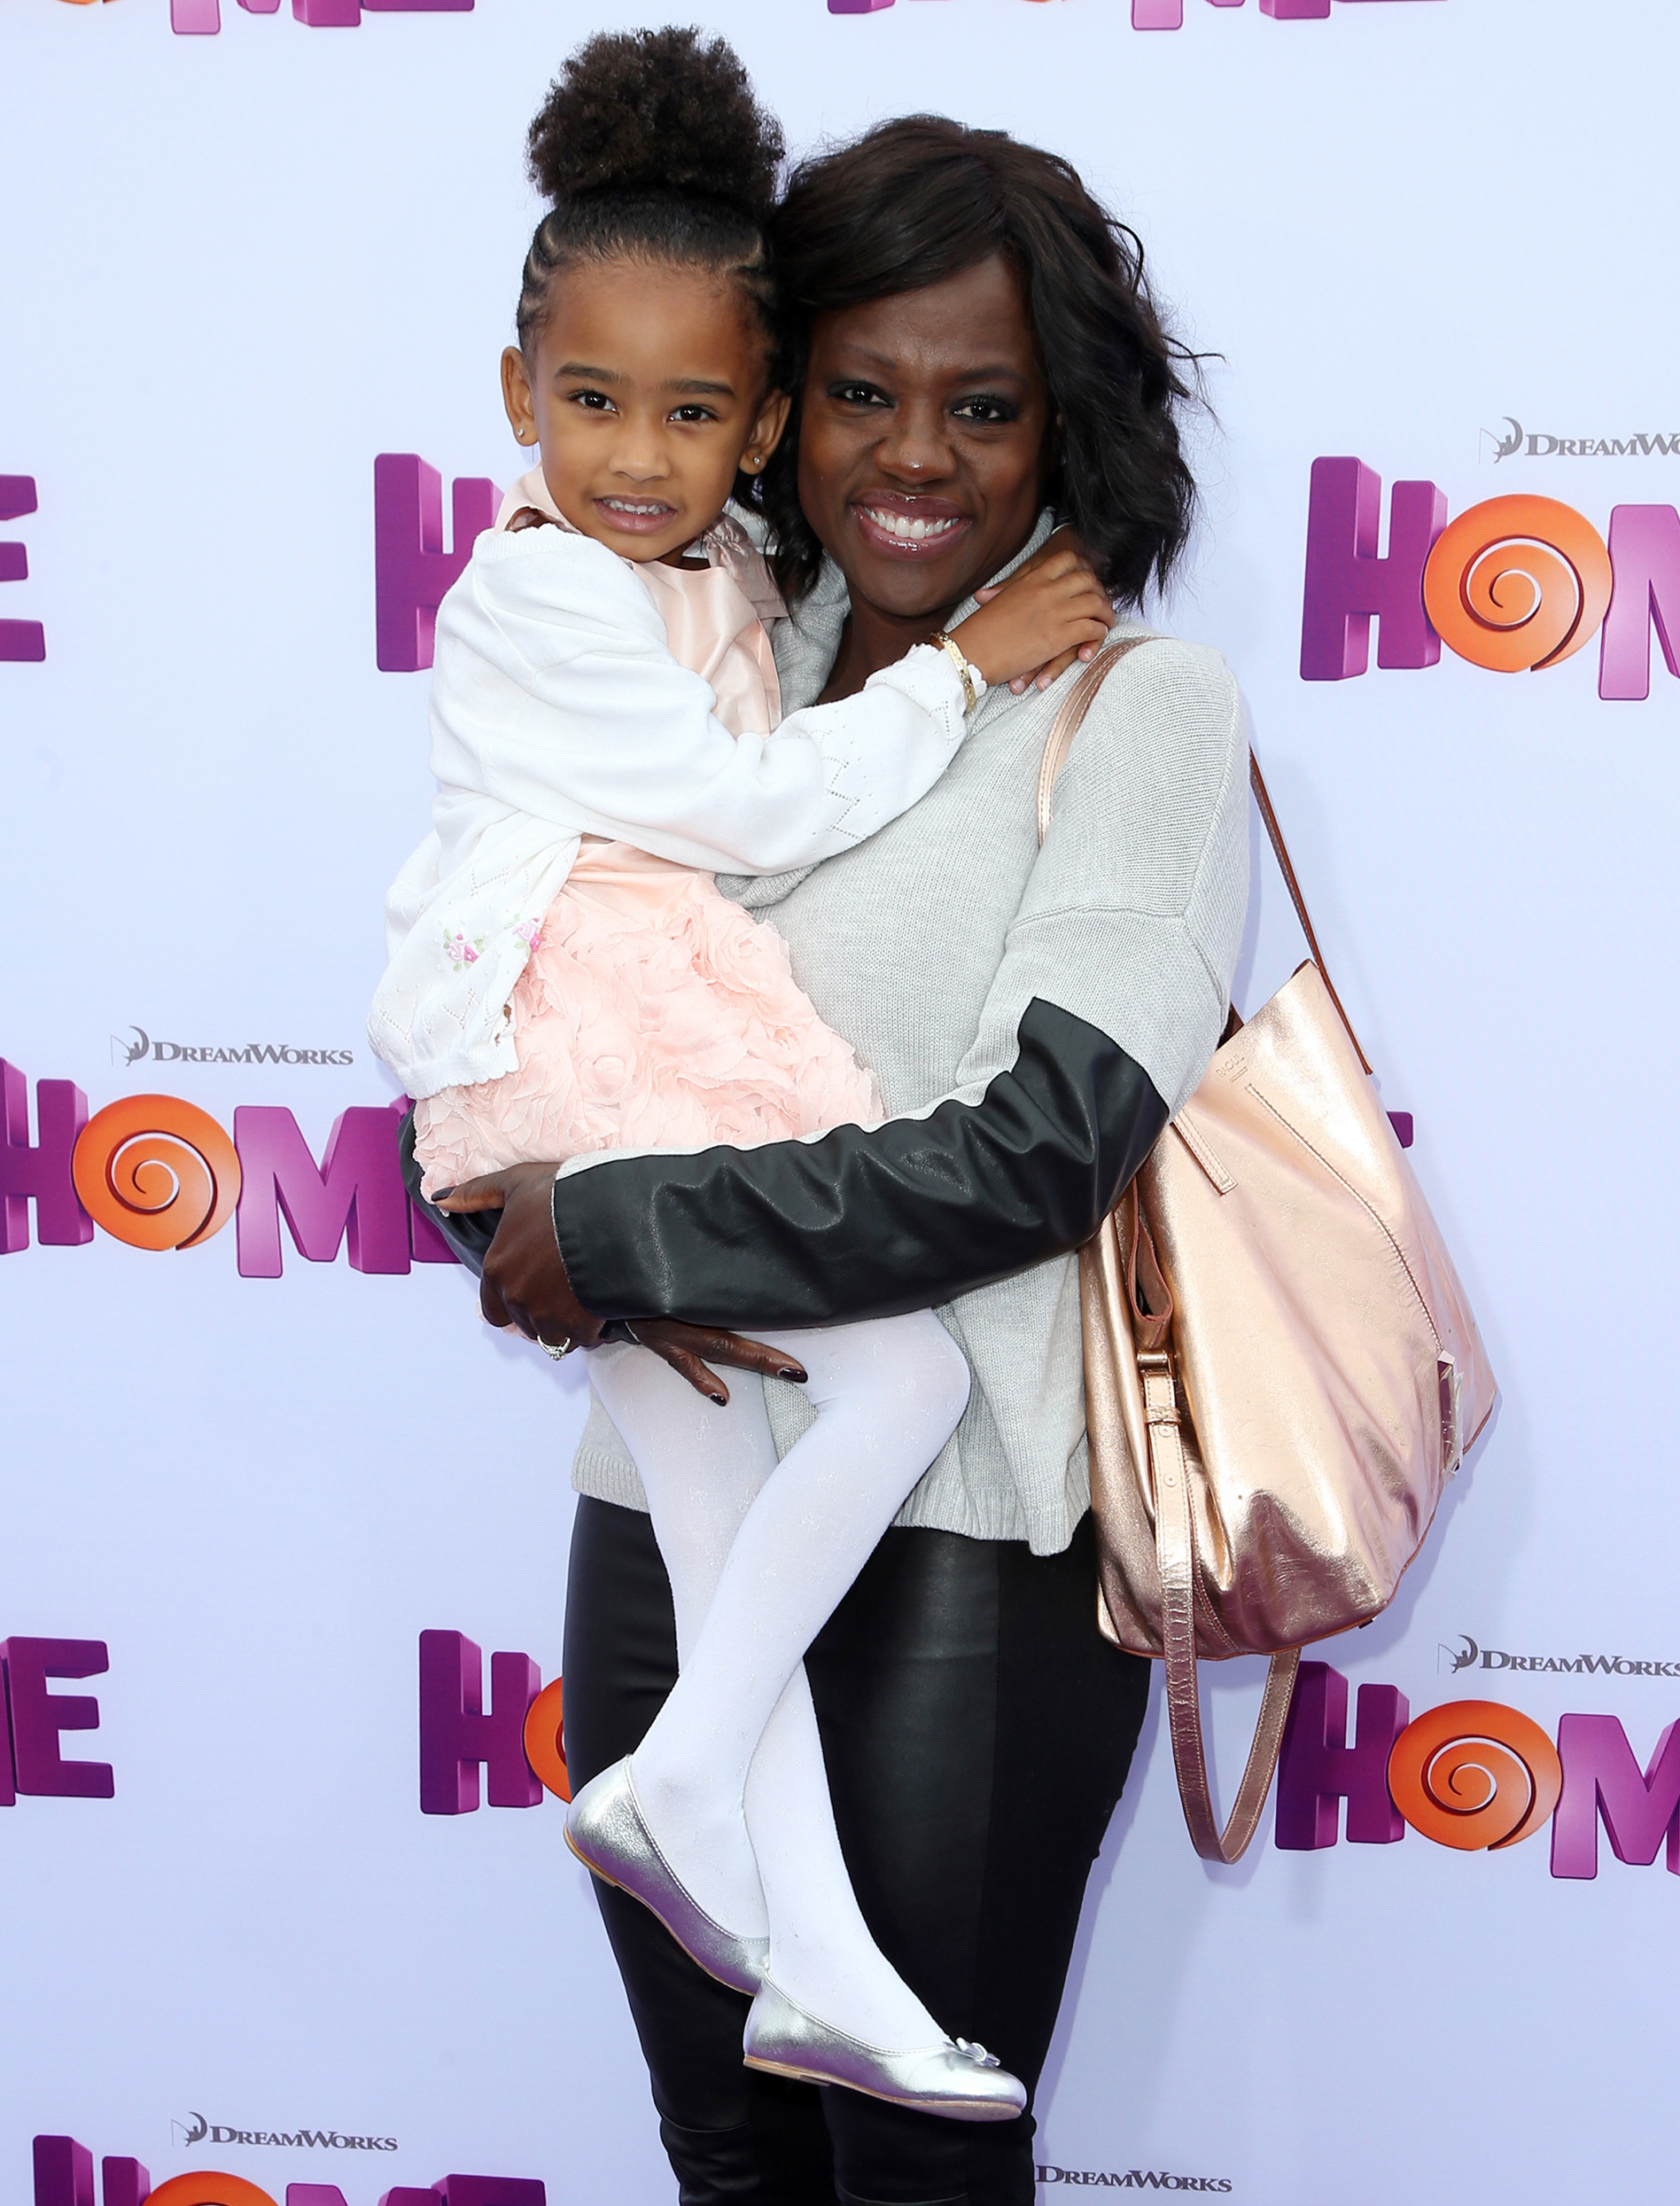 5. She's an amazing mom